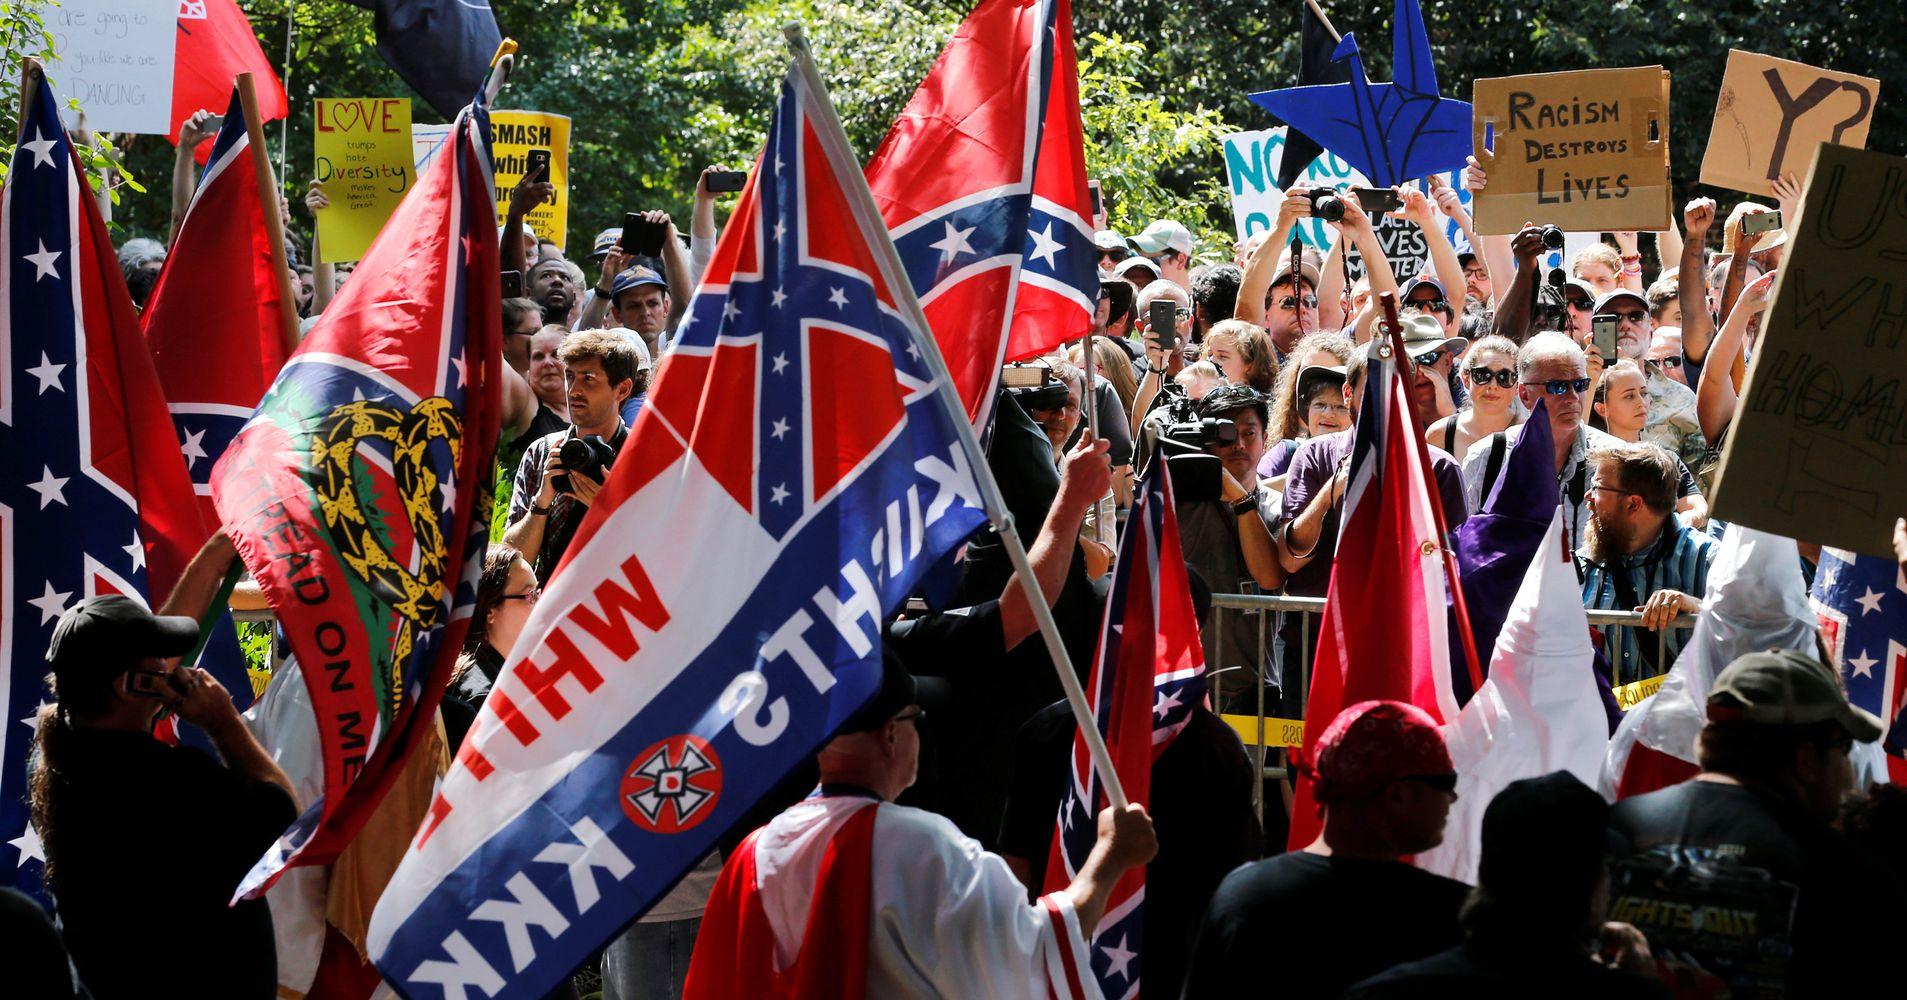 Klan Members Rally Against Removal Of Robert E. Lee Statue In Virginia